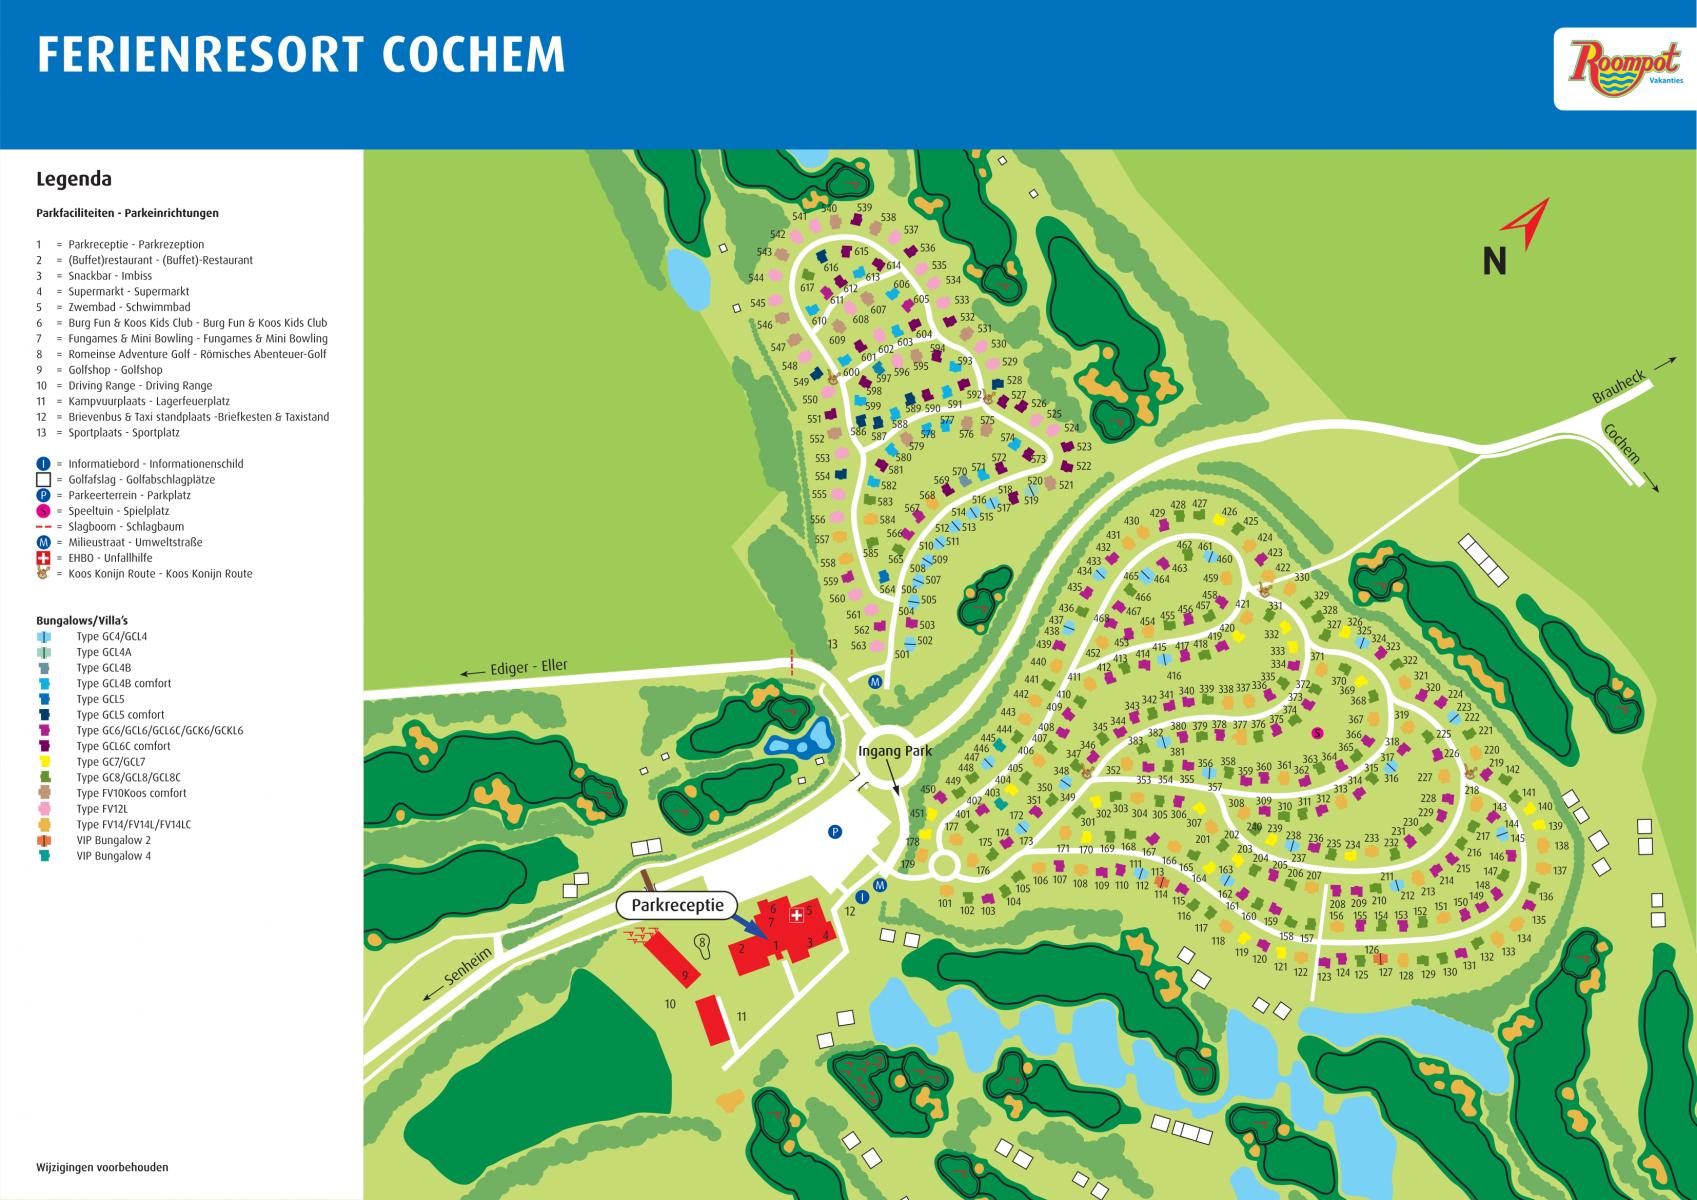 Roompot Ferienresort Cochem